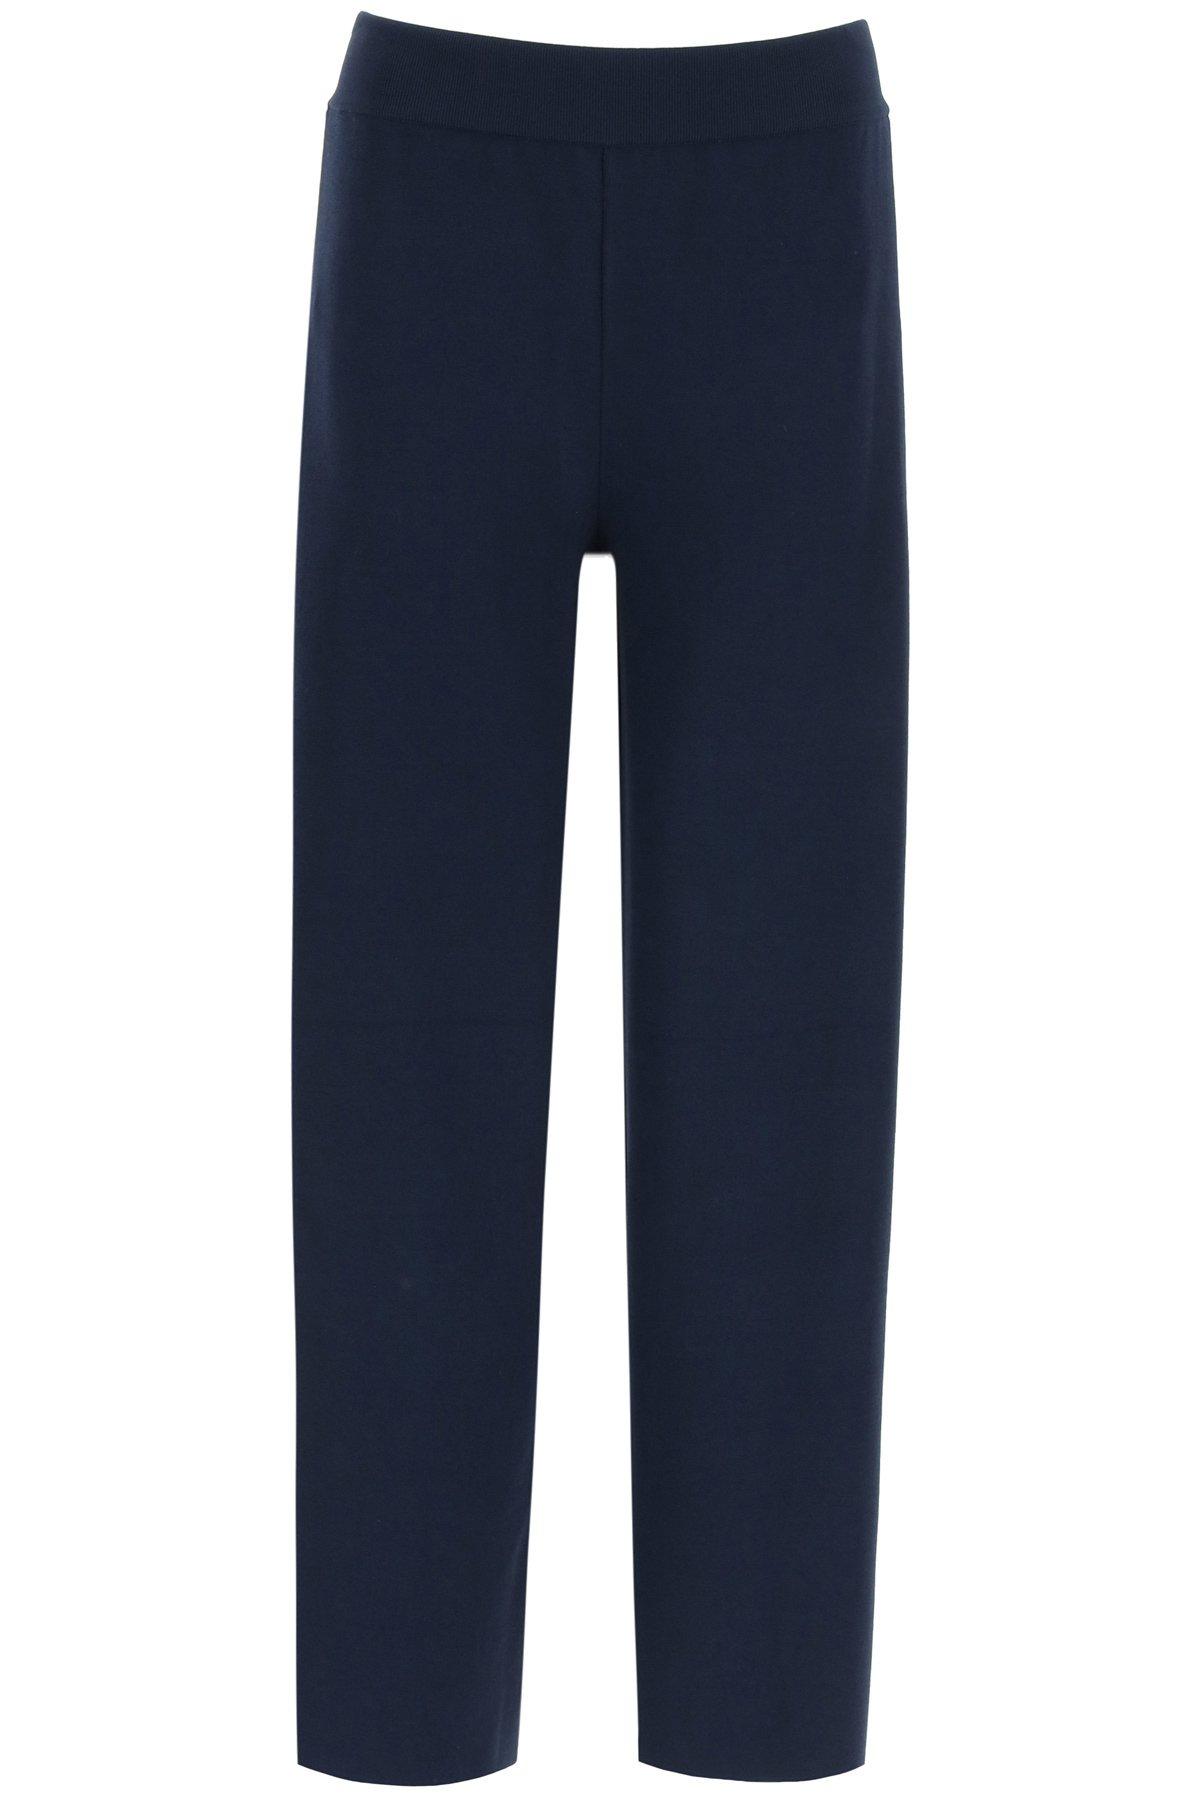 Antonino valenti pantaloni audrey